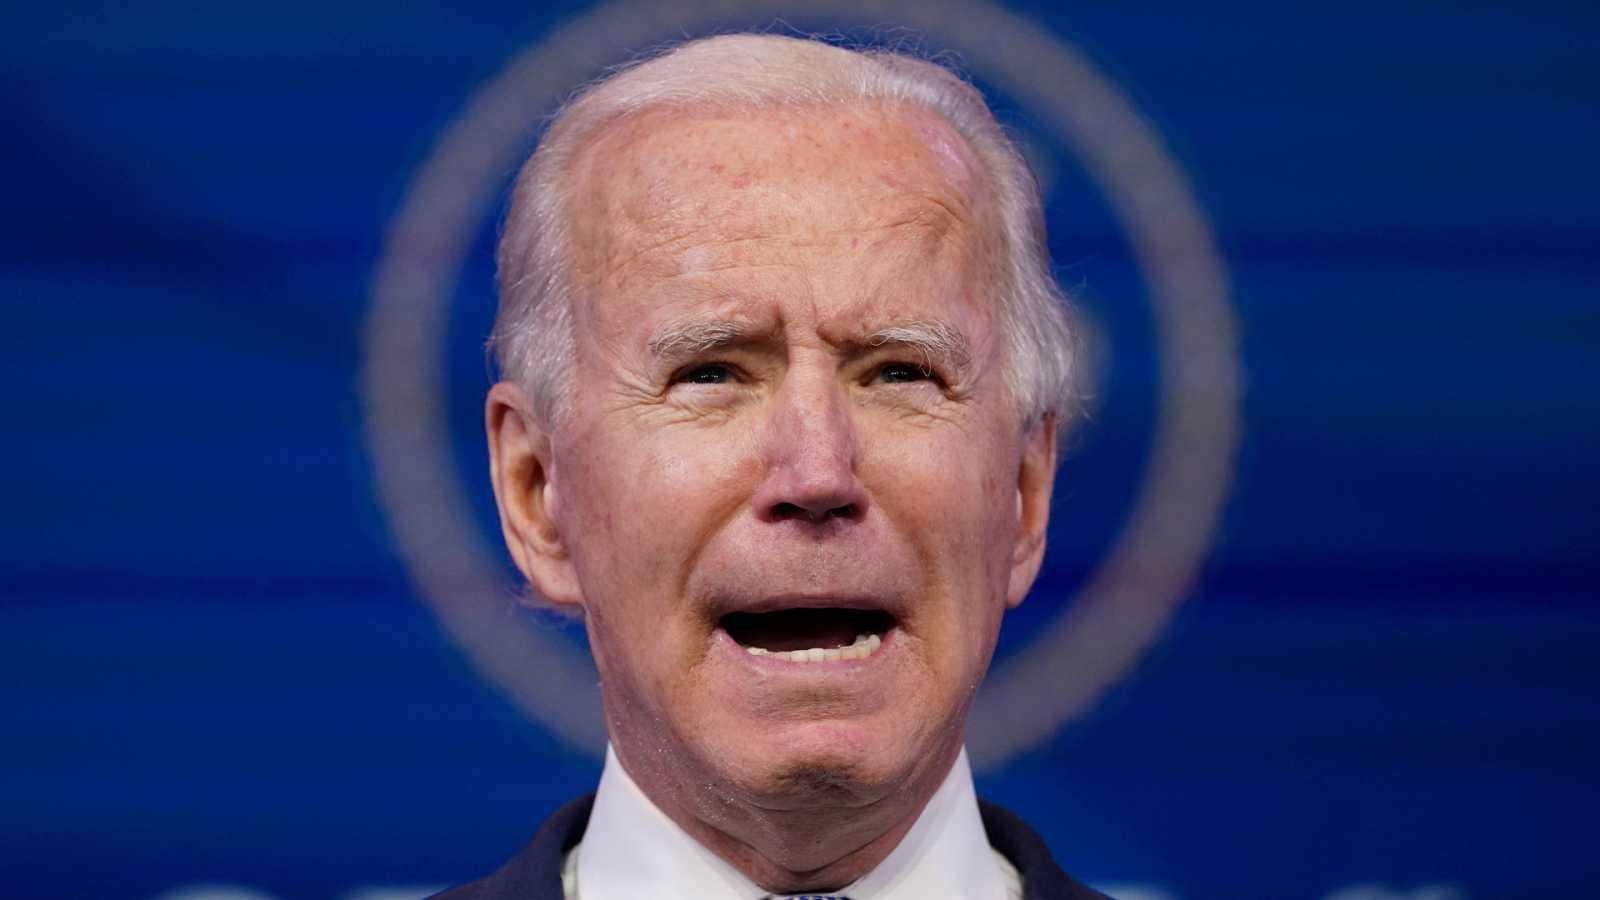 Asia hoy - Asia en la agenda internacional de Joe Biden - 20/01/21 - escuchar ahora